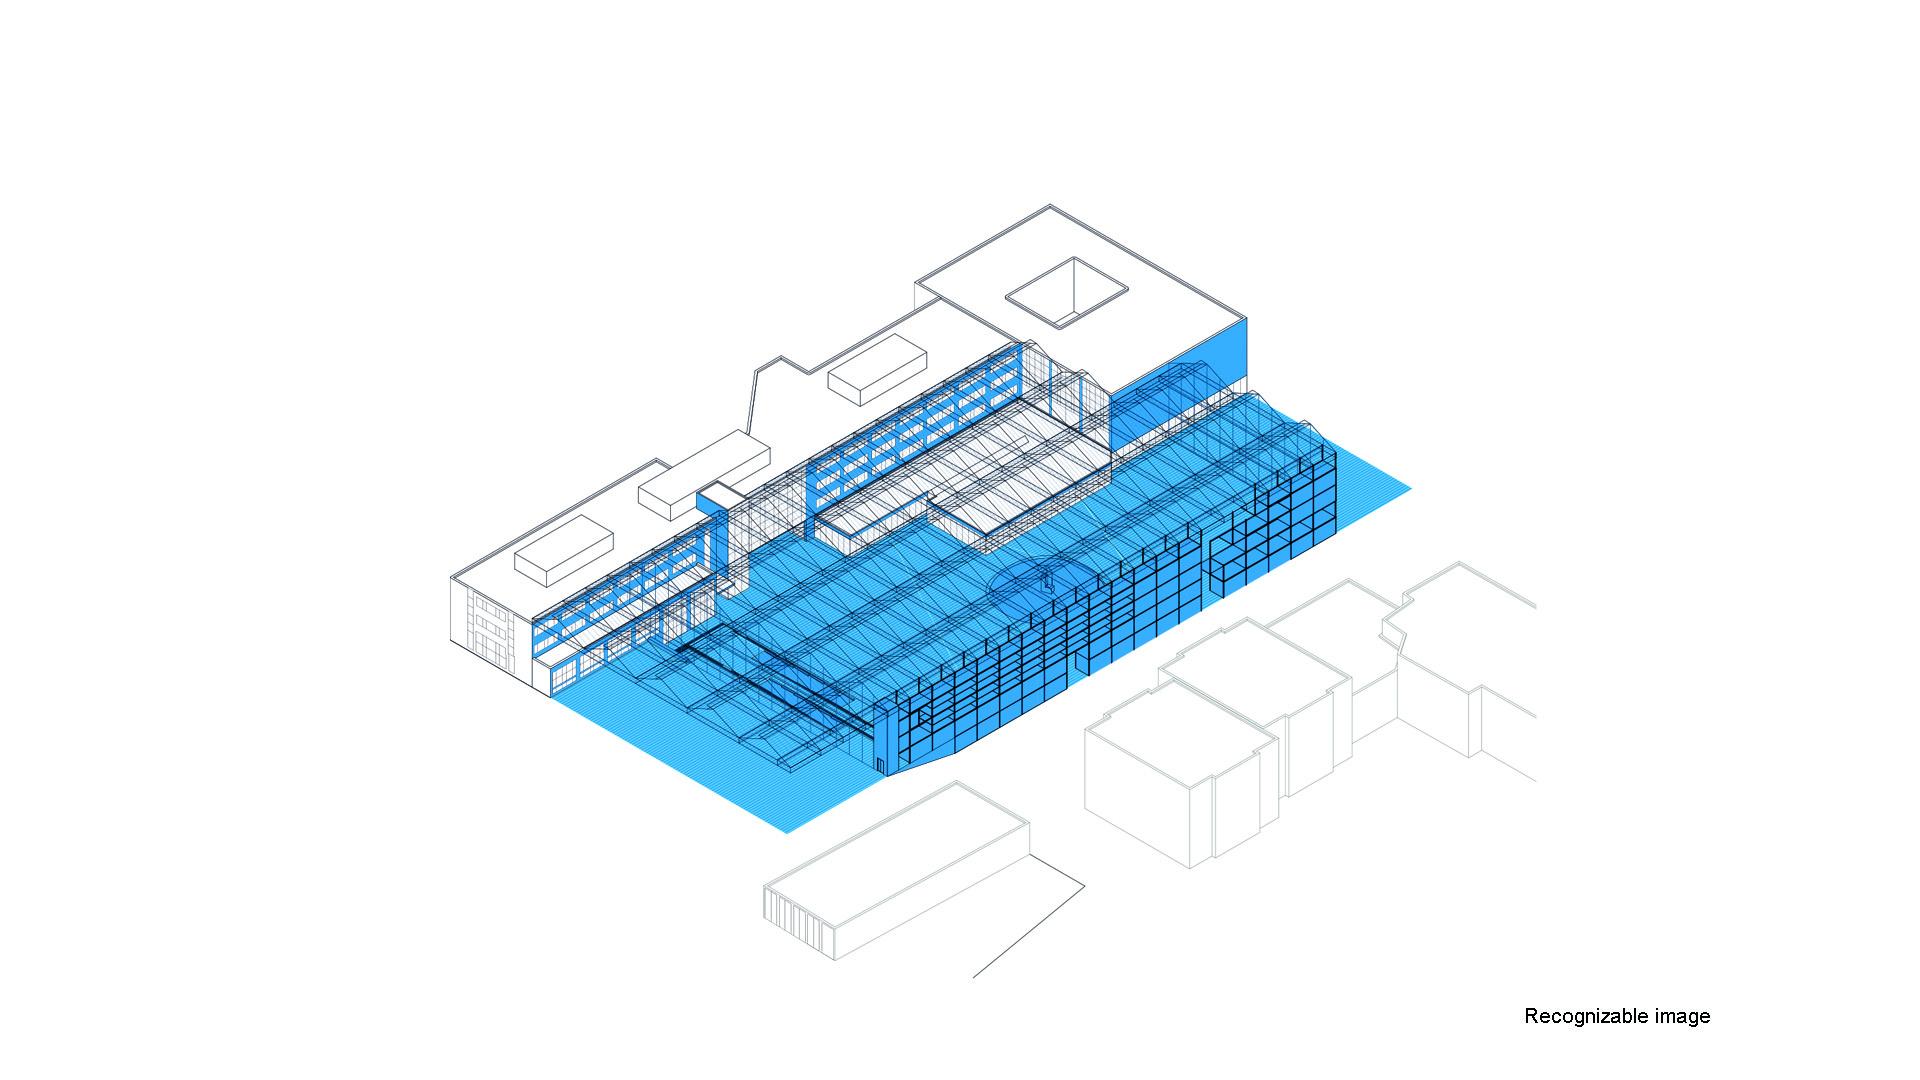 02_furuset diagram